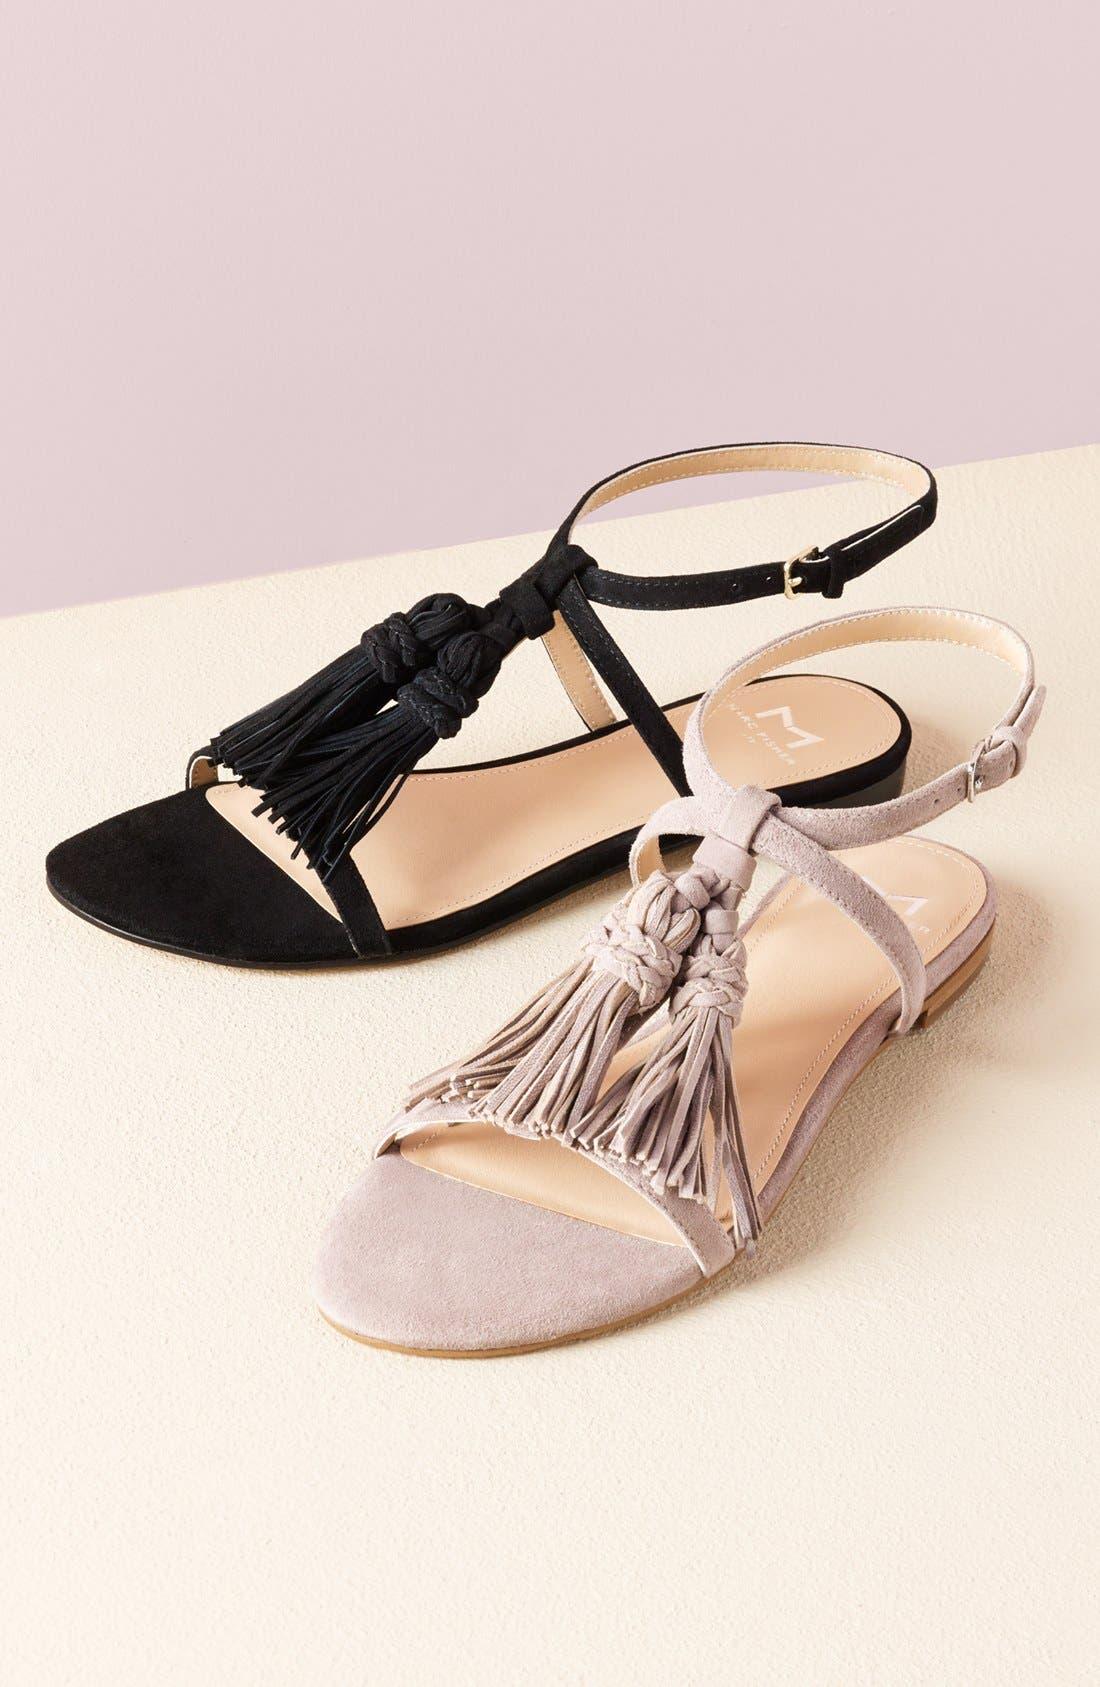 'Crystal' Tassel Flat Sandal,                             Main thumbnail 1, color,                             211